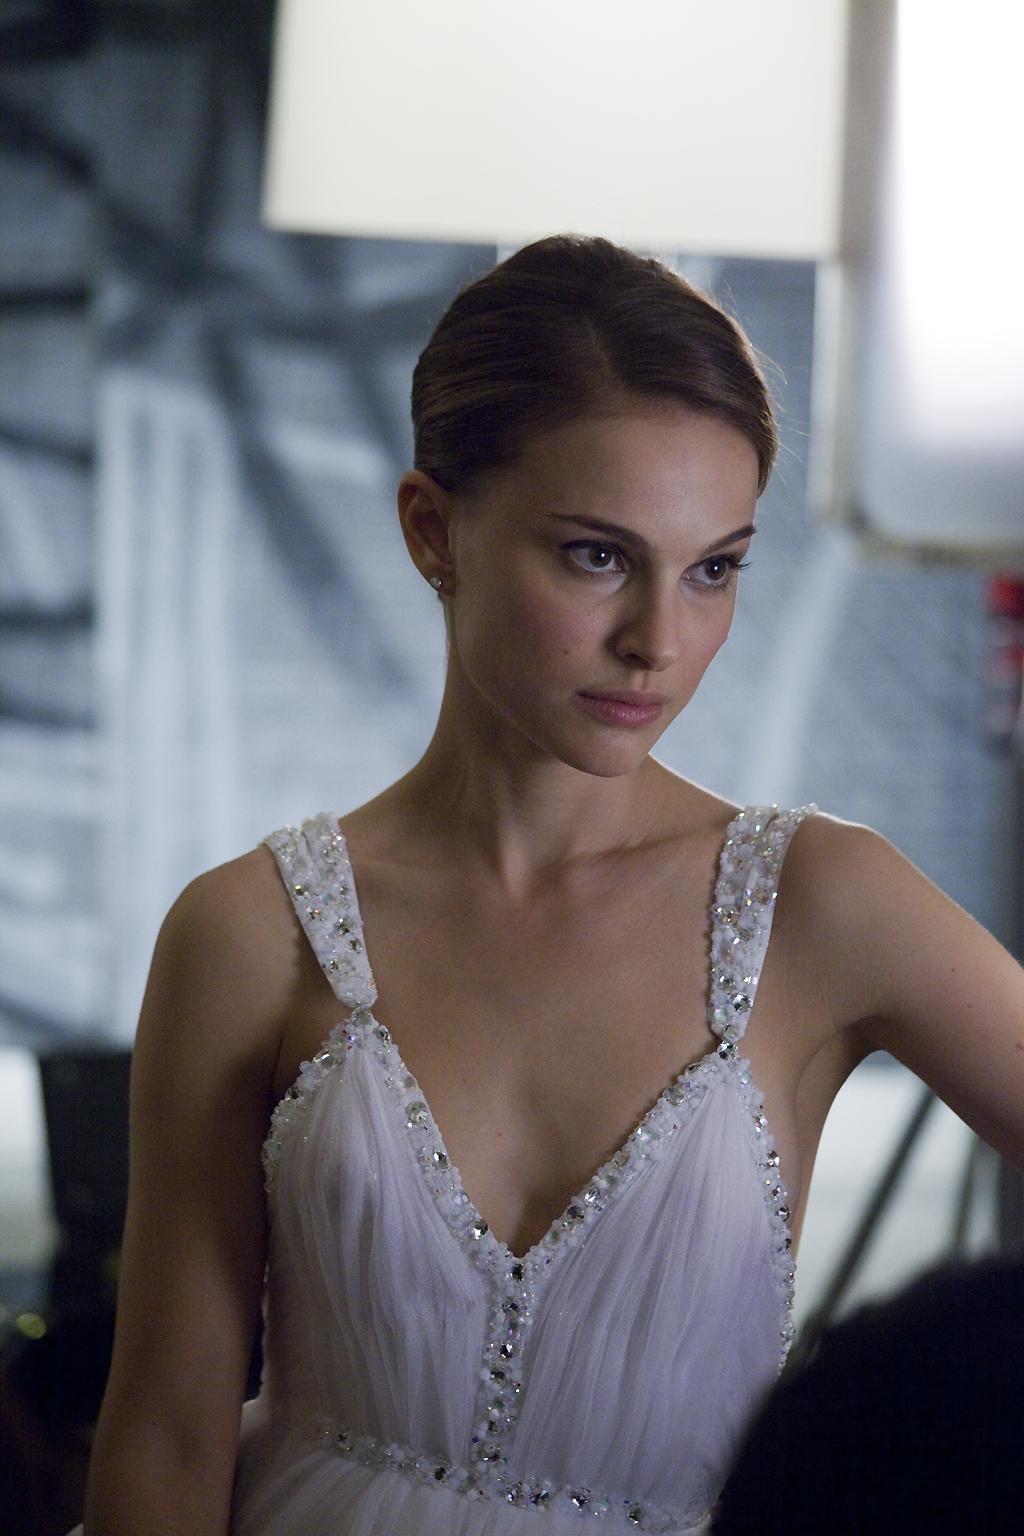 Natalie Portman | natalie in 2019 | Natalie portman, Natalie ...